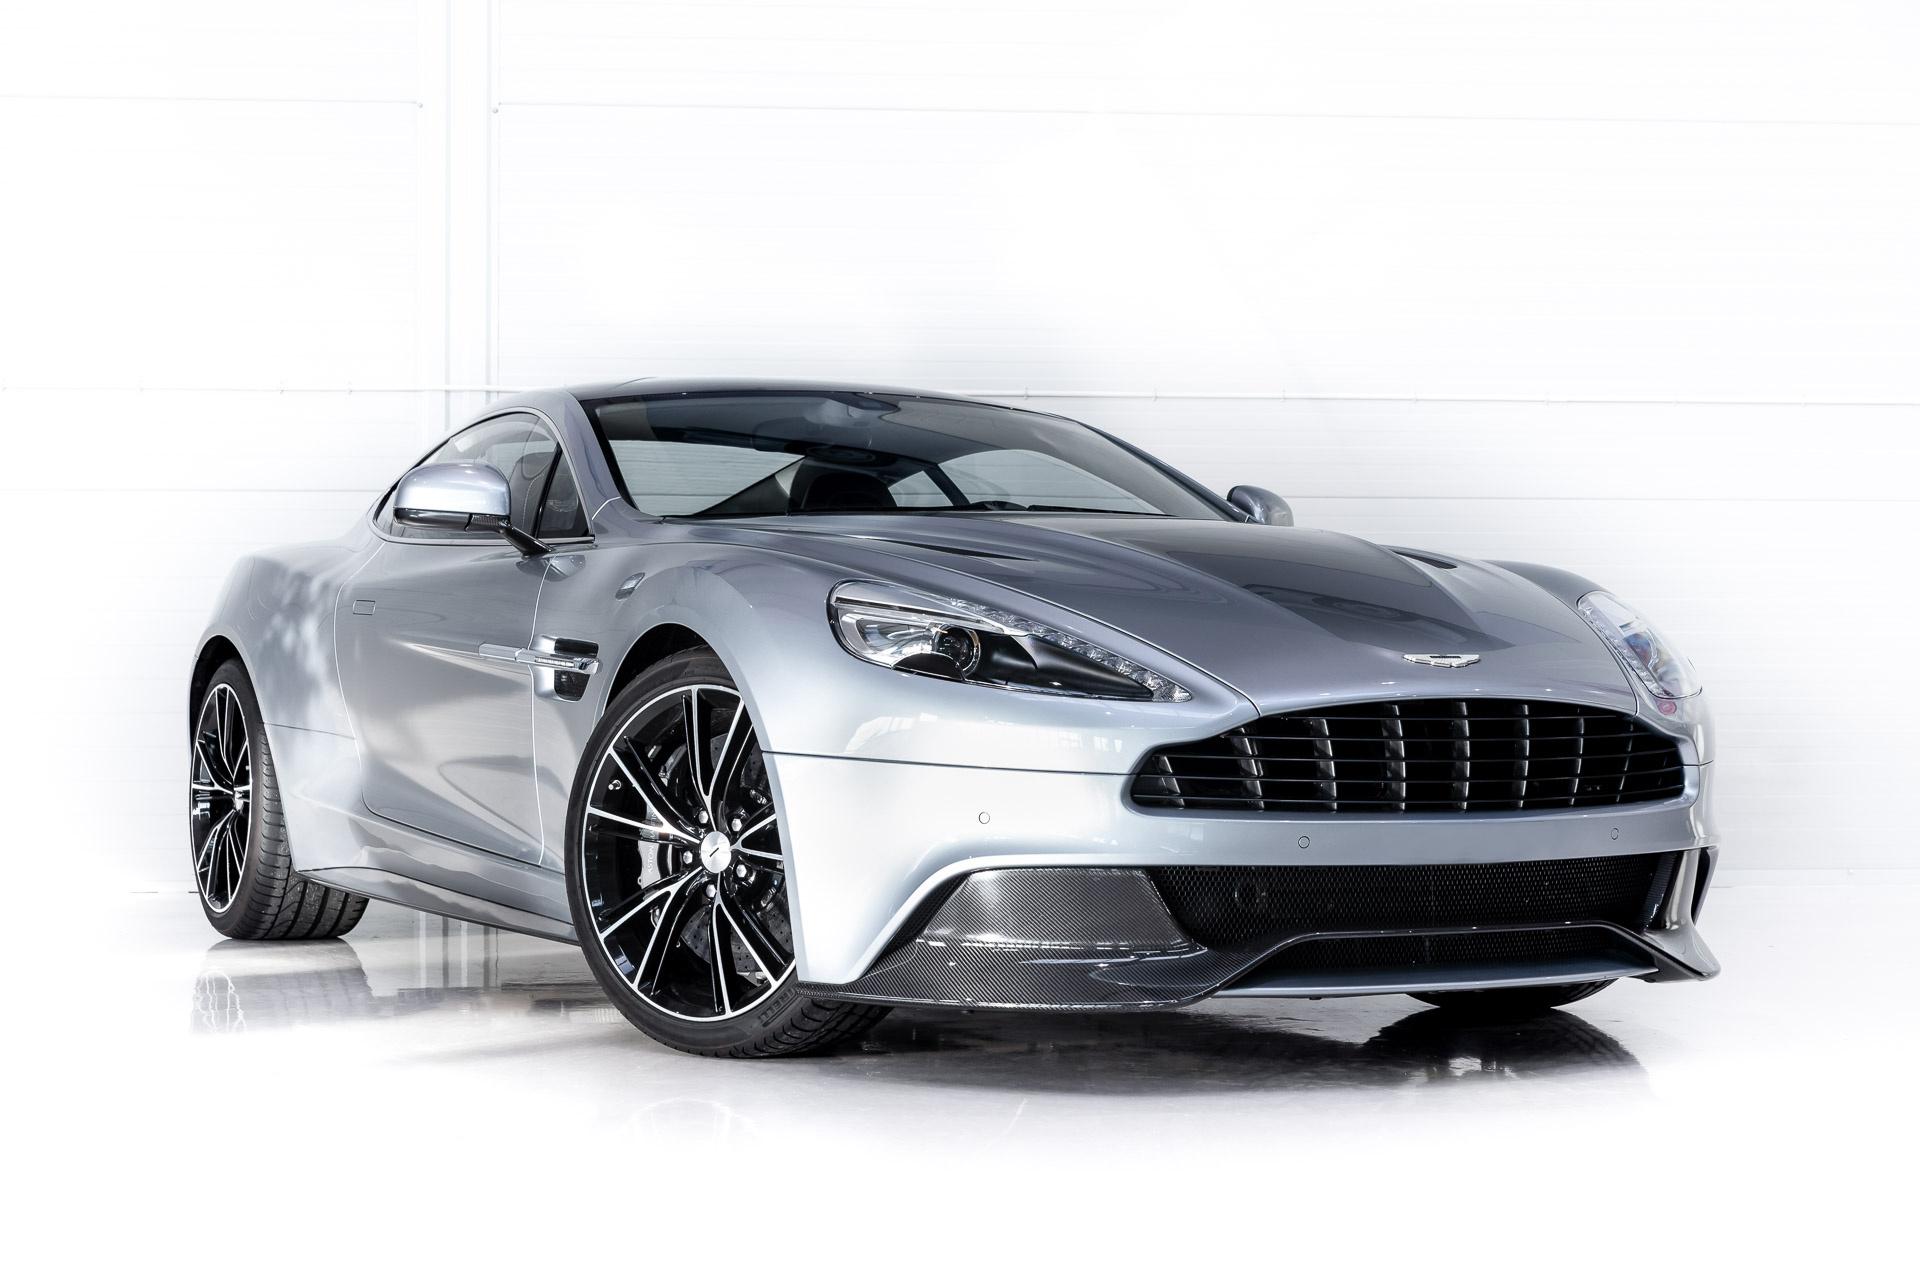 2015 Aston Martin Vanquish Centenary Edition 1 Of 100 Classic Driver Market